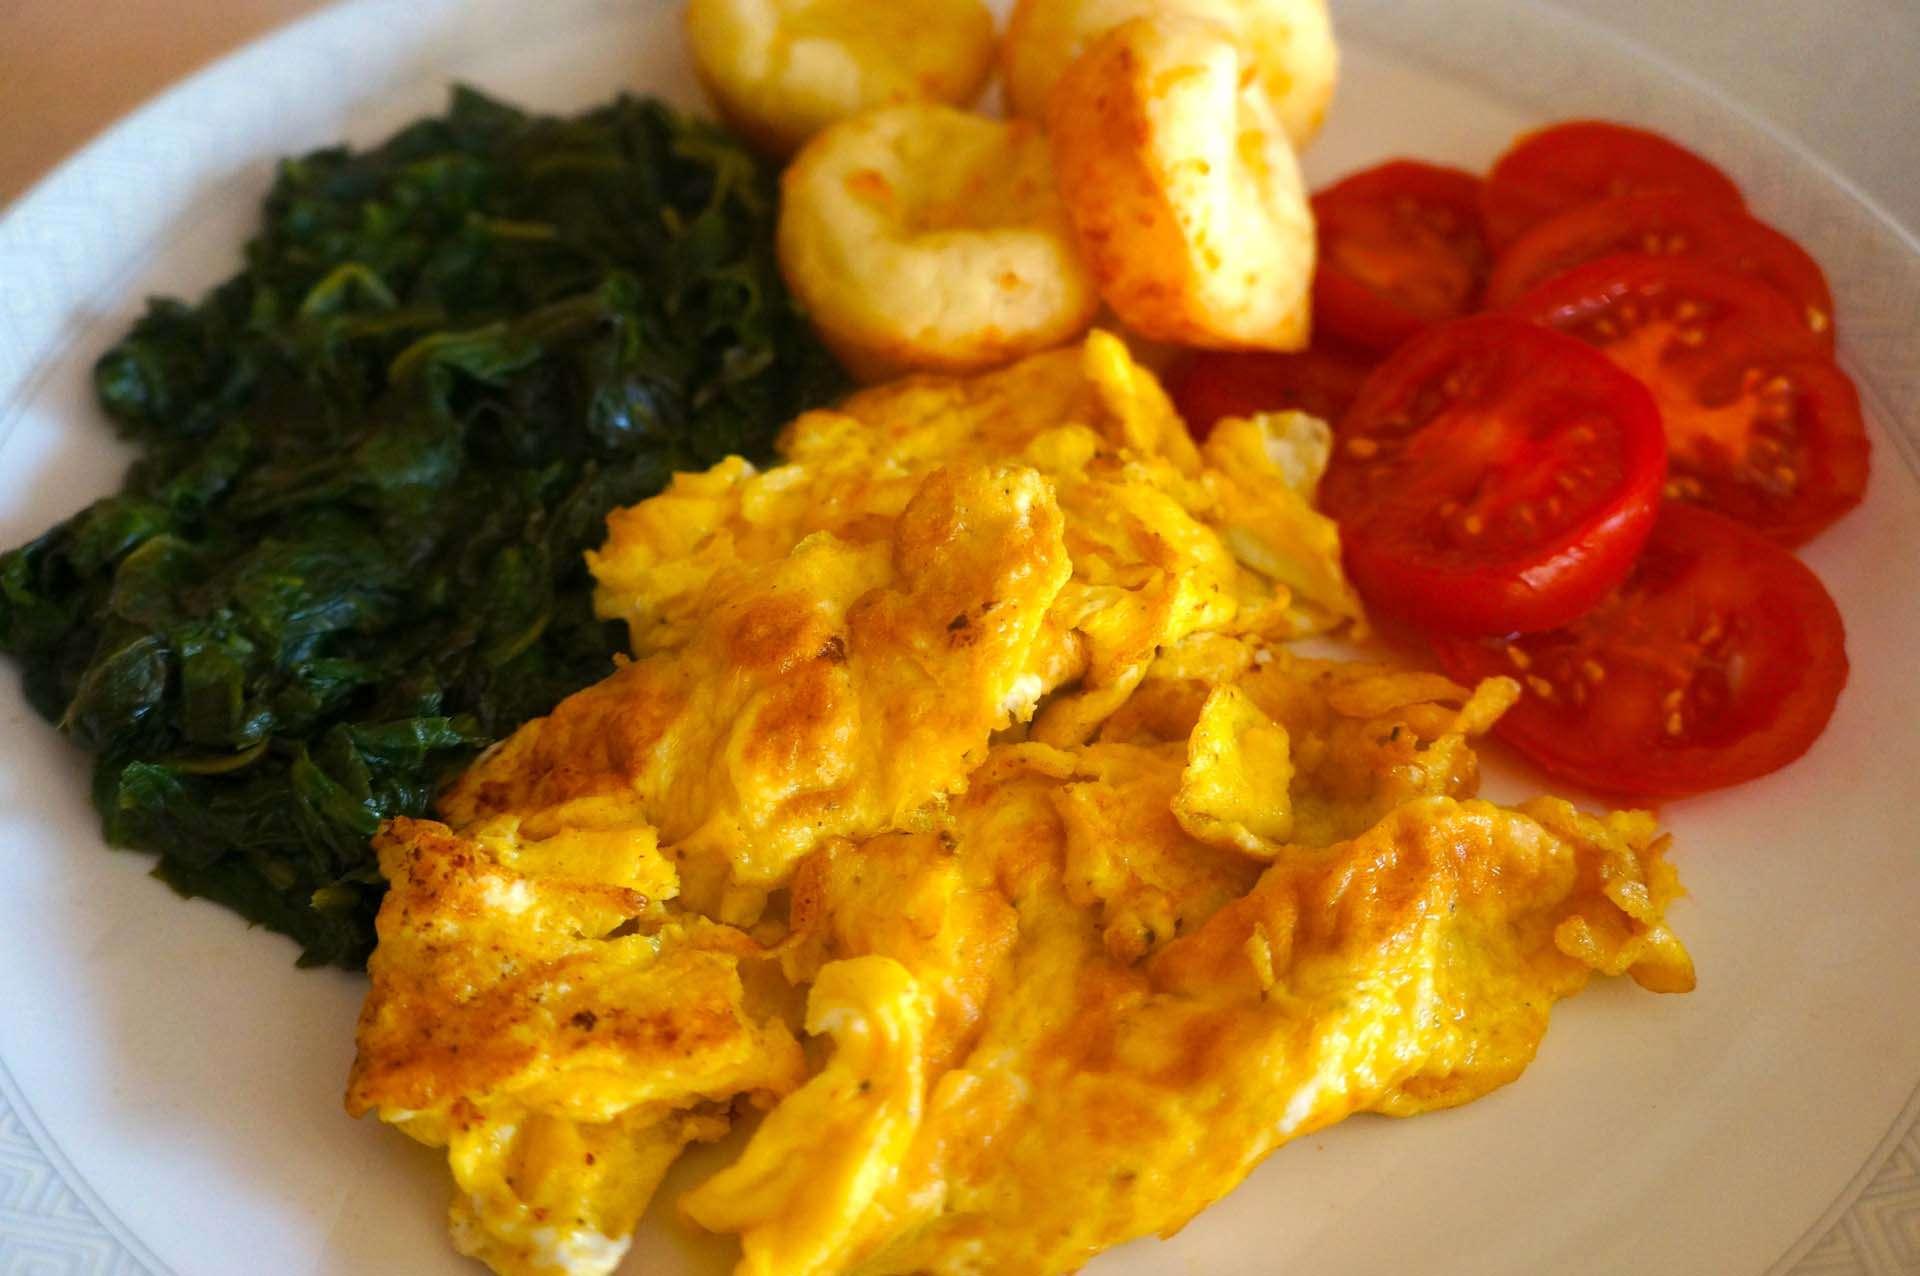 Fried Eggs with Habanero Grapefruit Hot Sauce